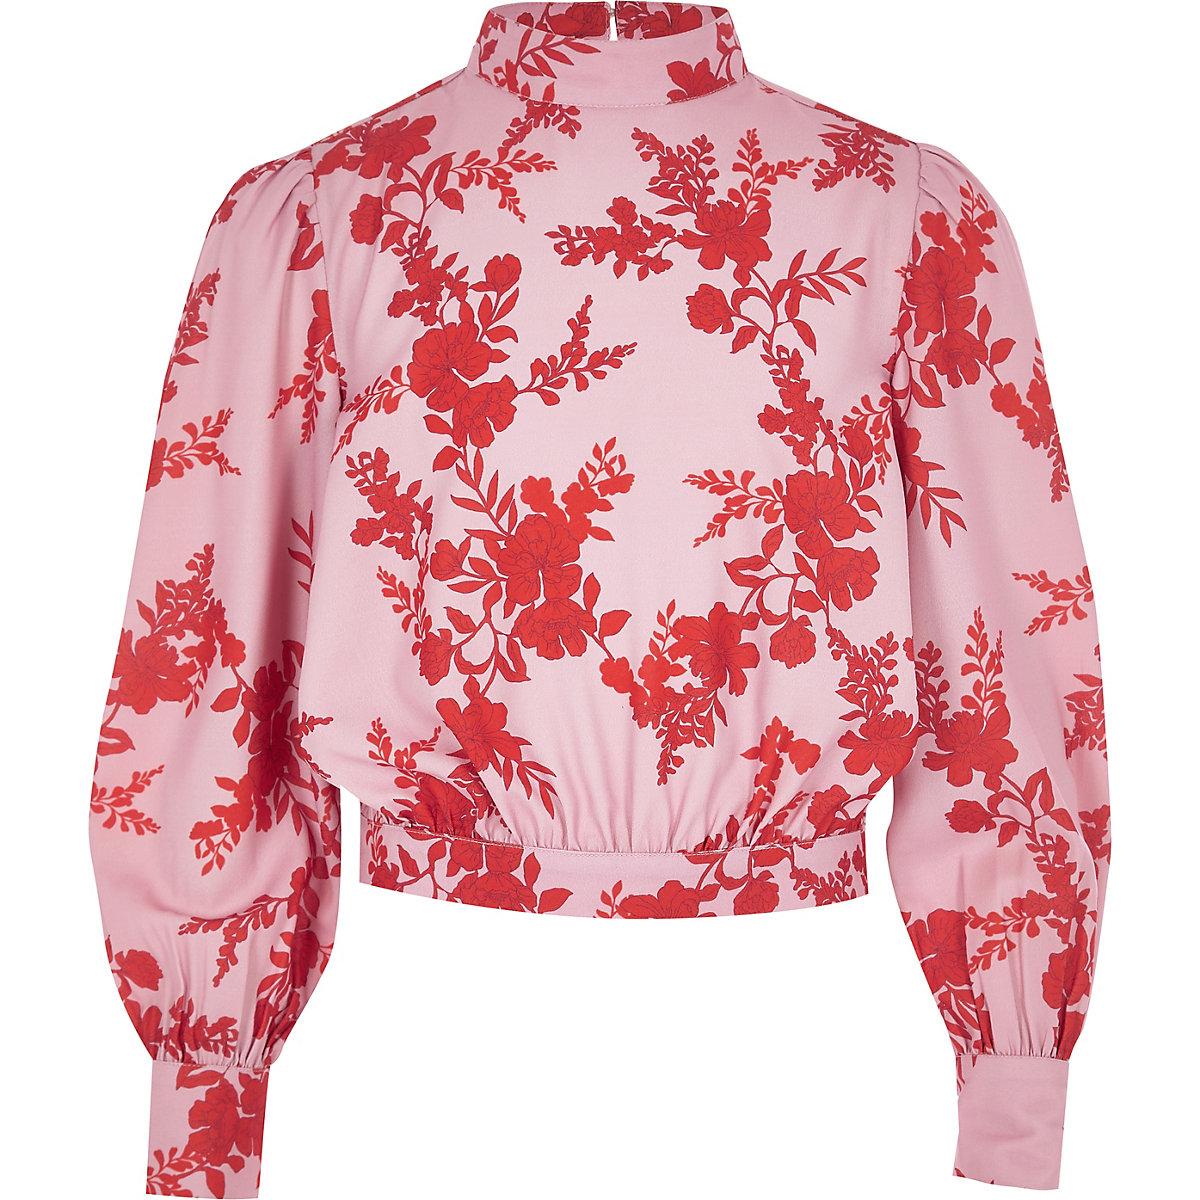 Girls pink floral high neck blouse